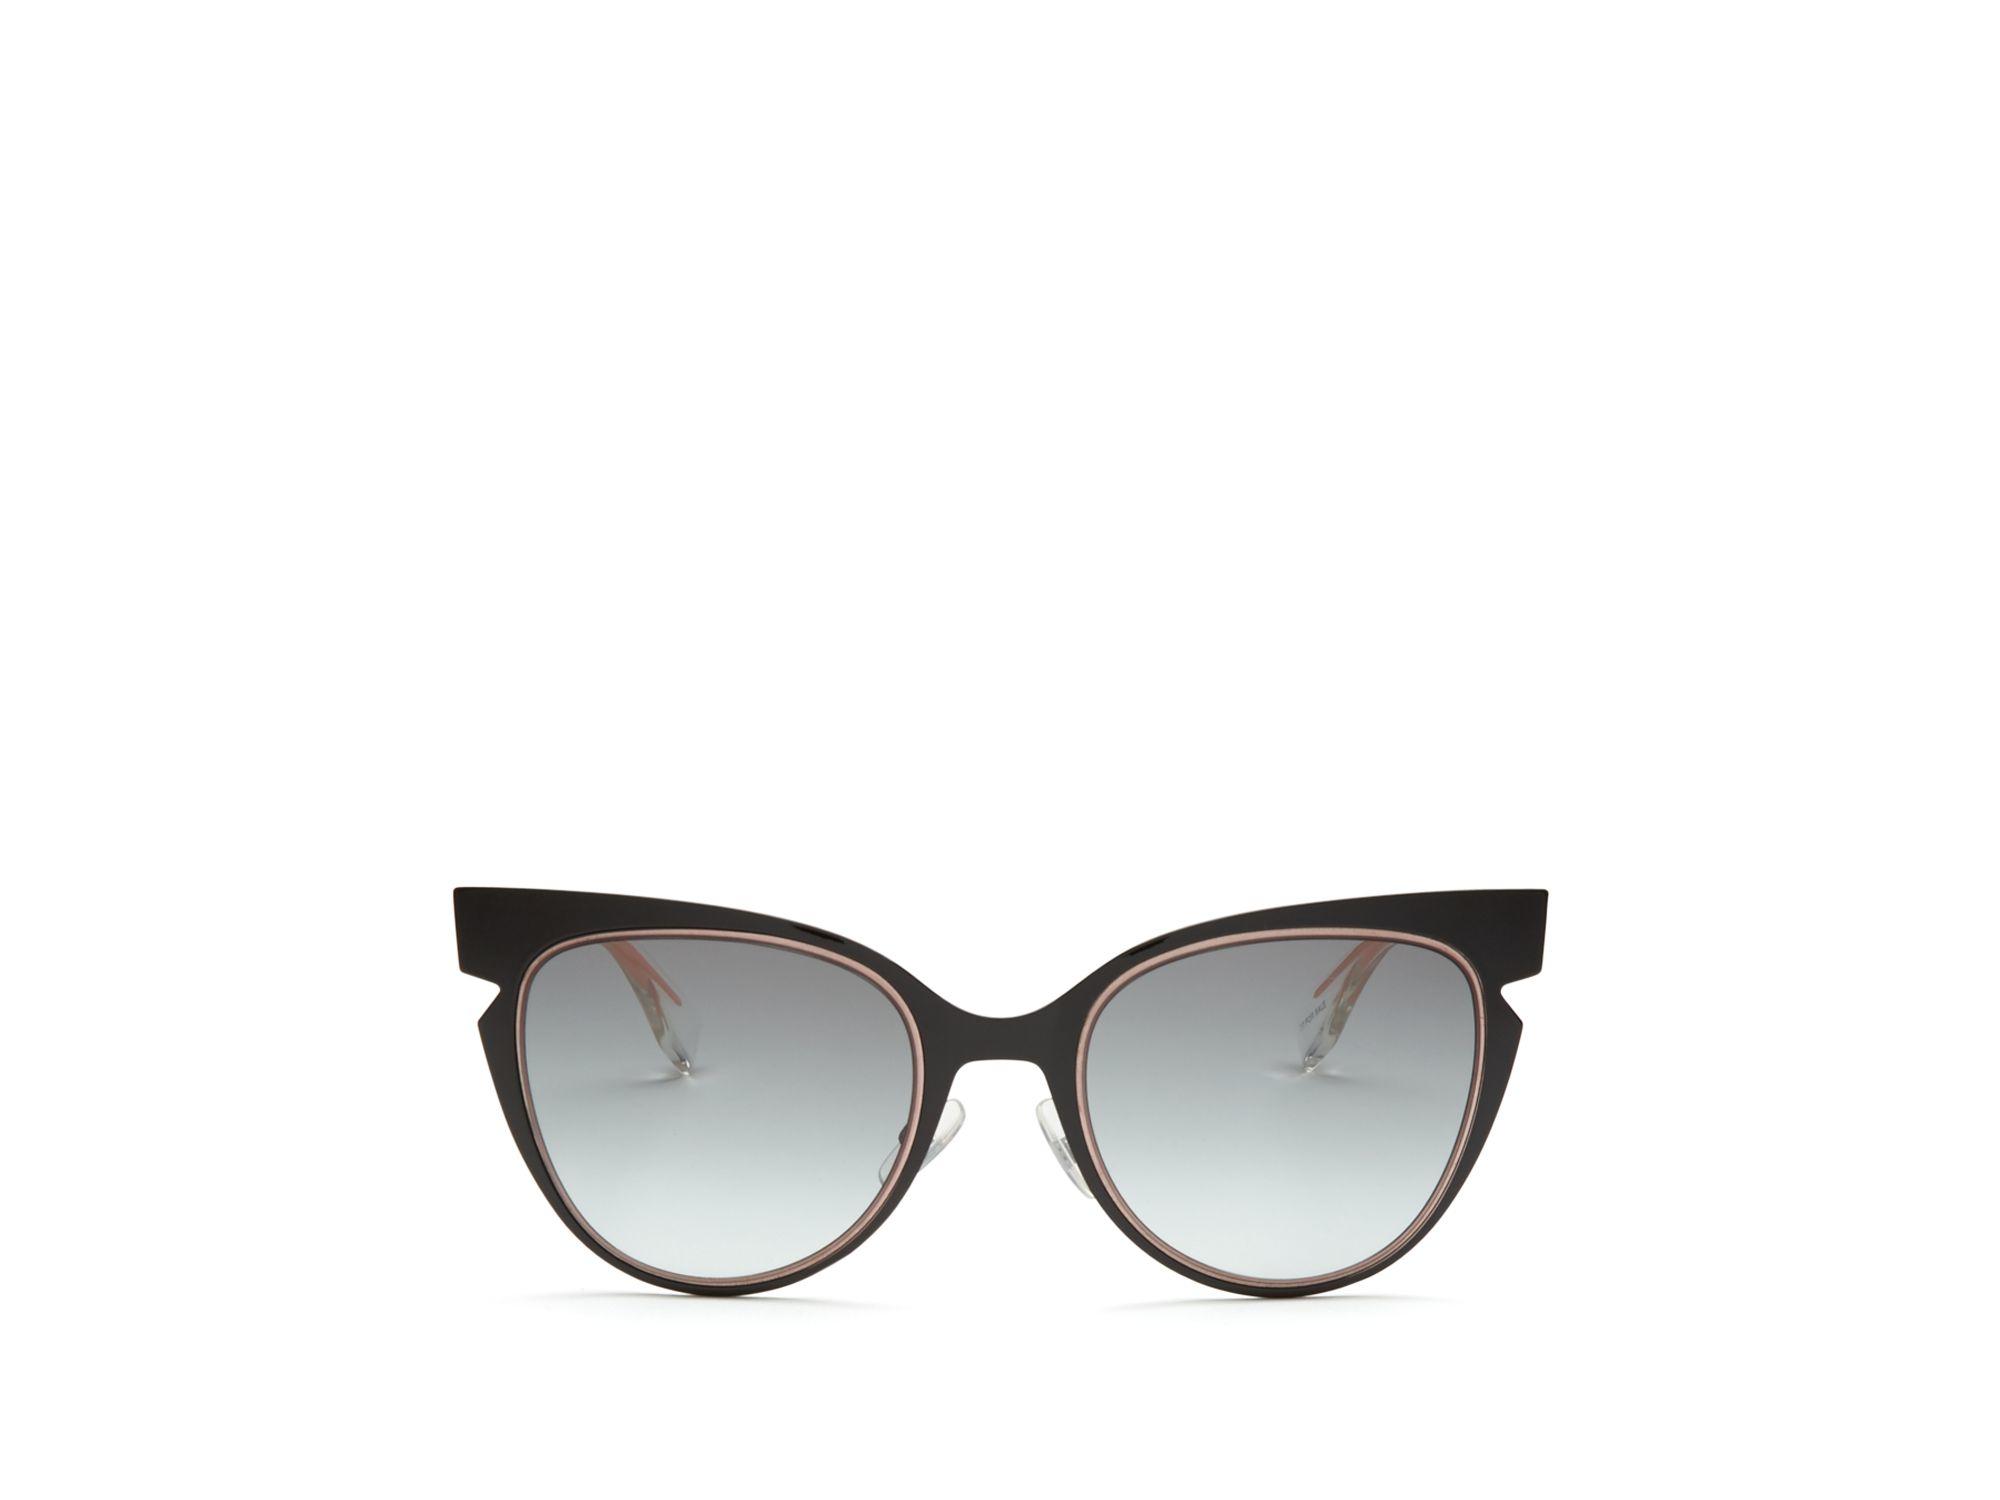 1105a306fc2 Fendi - Black Cut Out Cat Eye Sunglasses